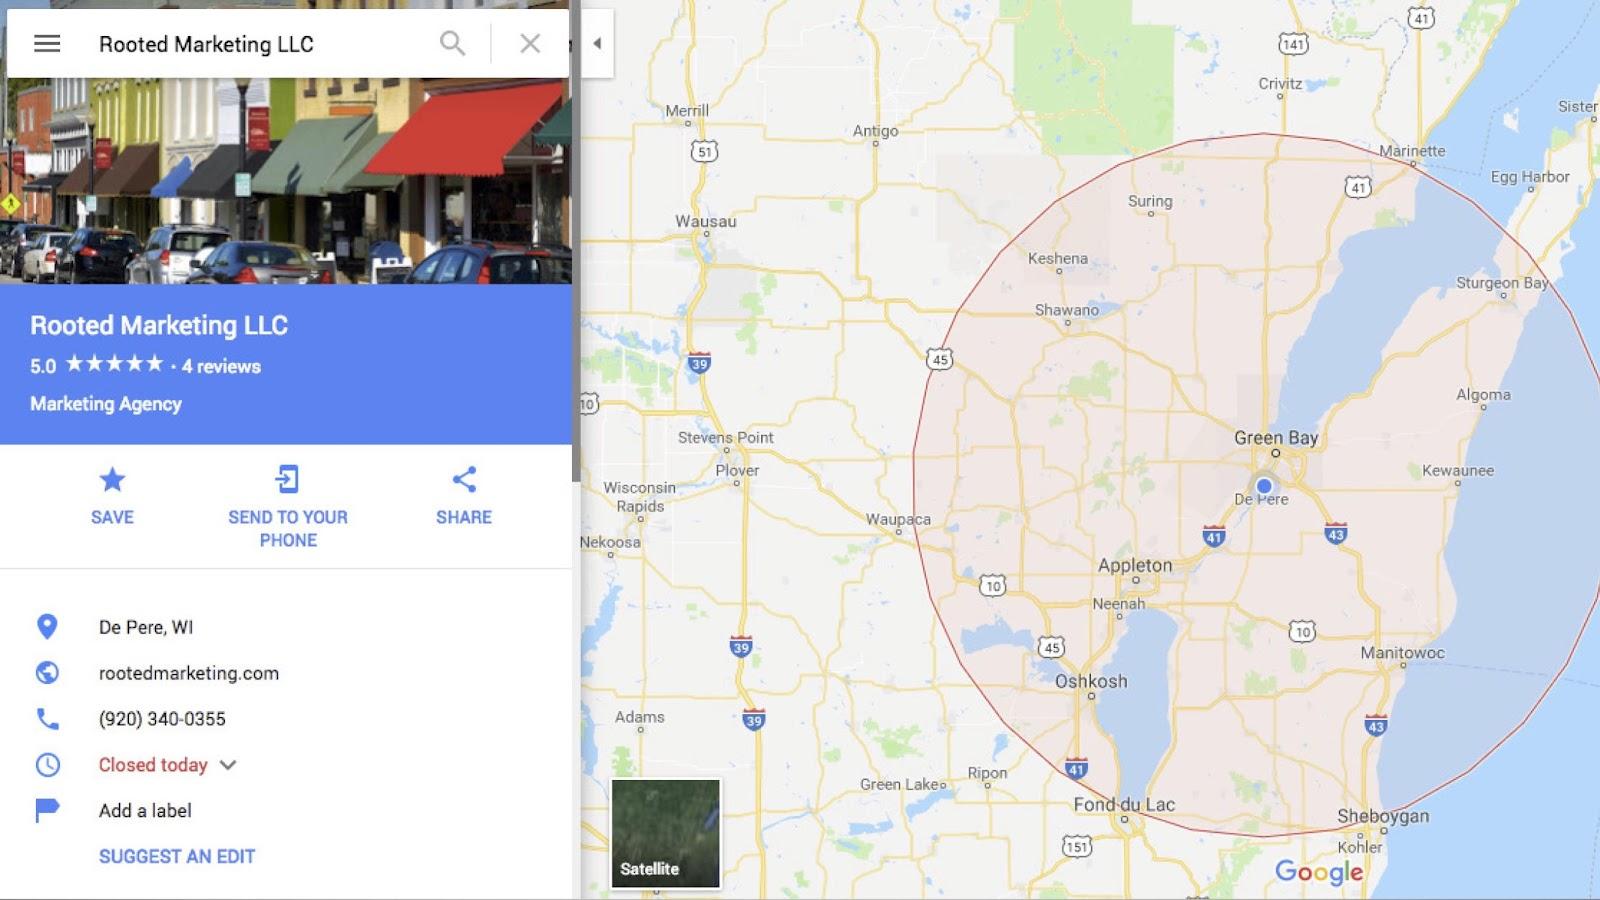 Service Area Business Map on Google